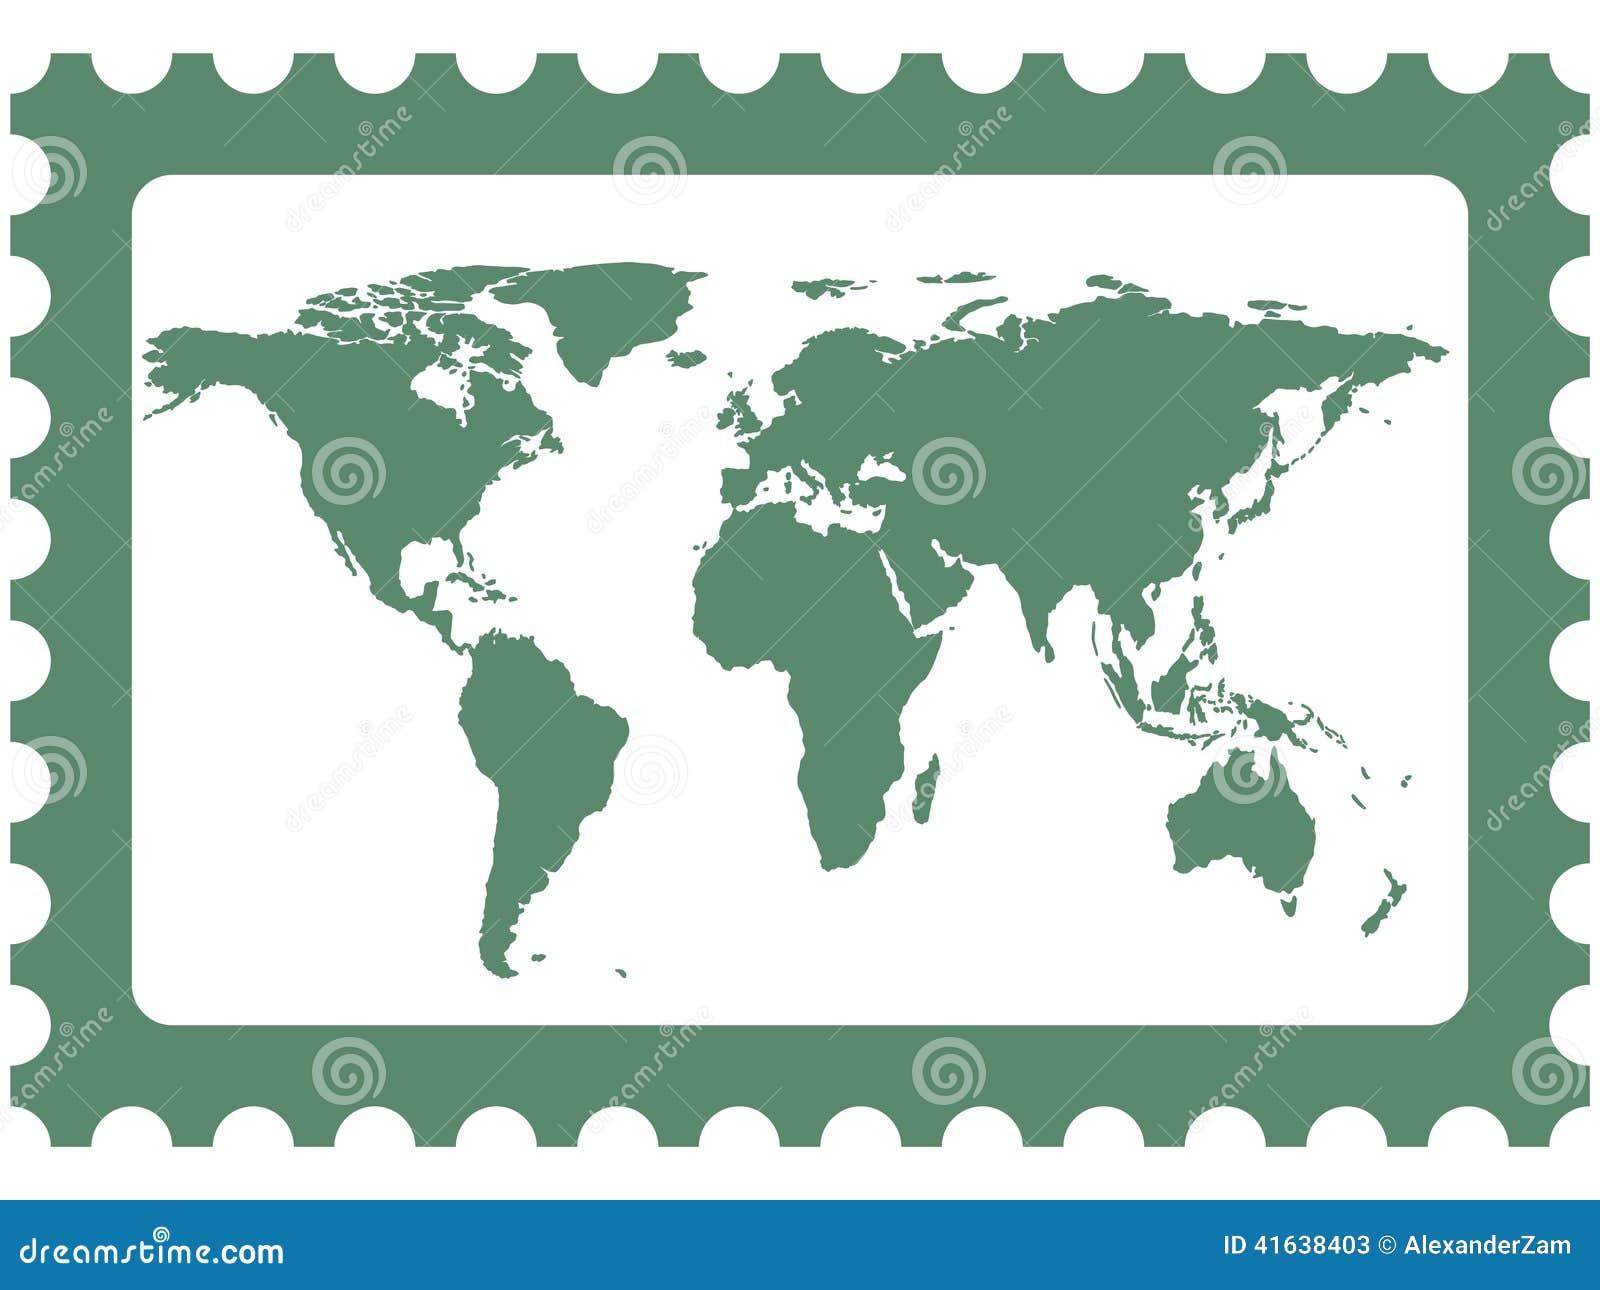 World map on stamp stock vector. Illustration of world   41638403